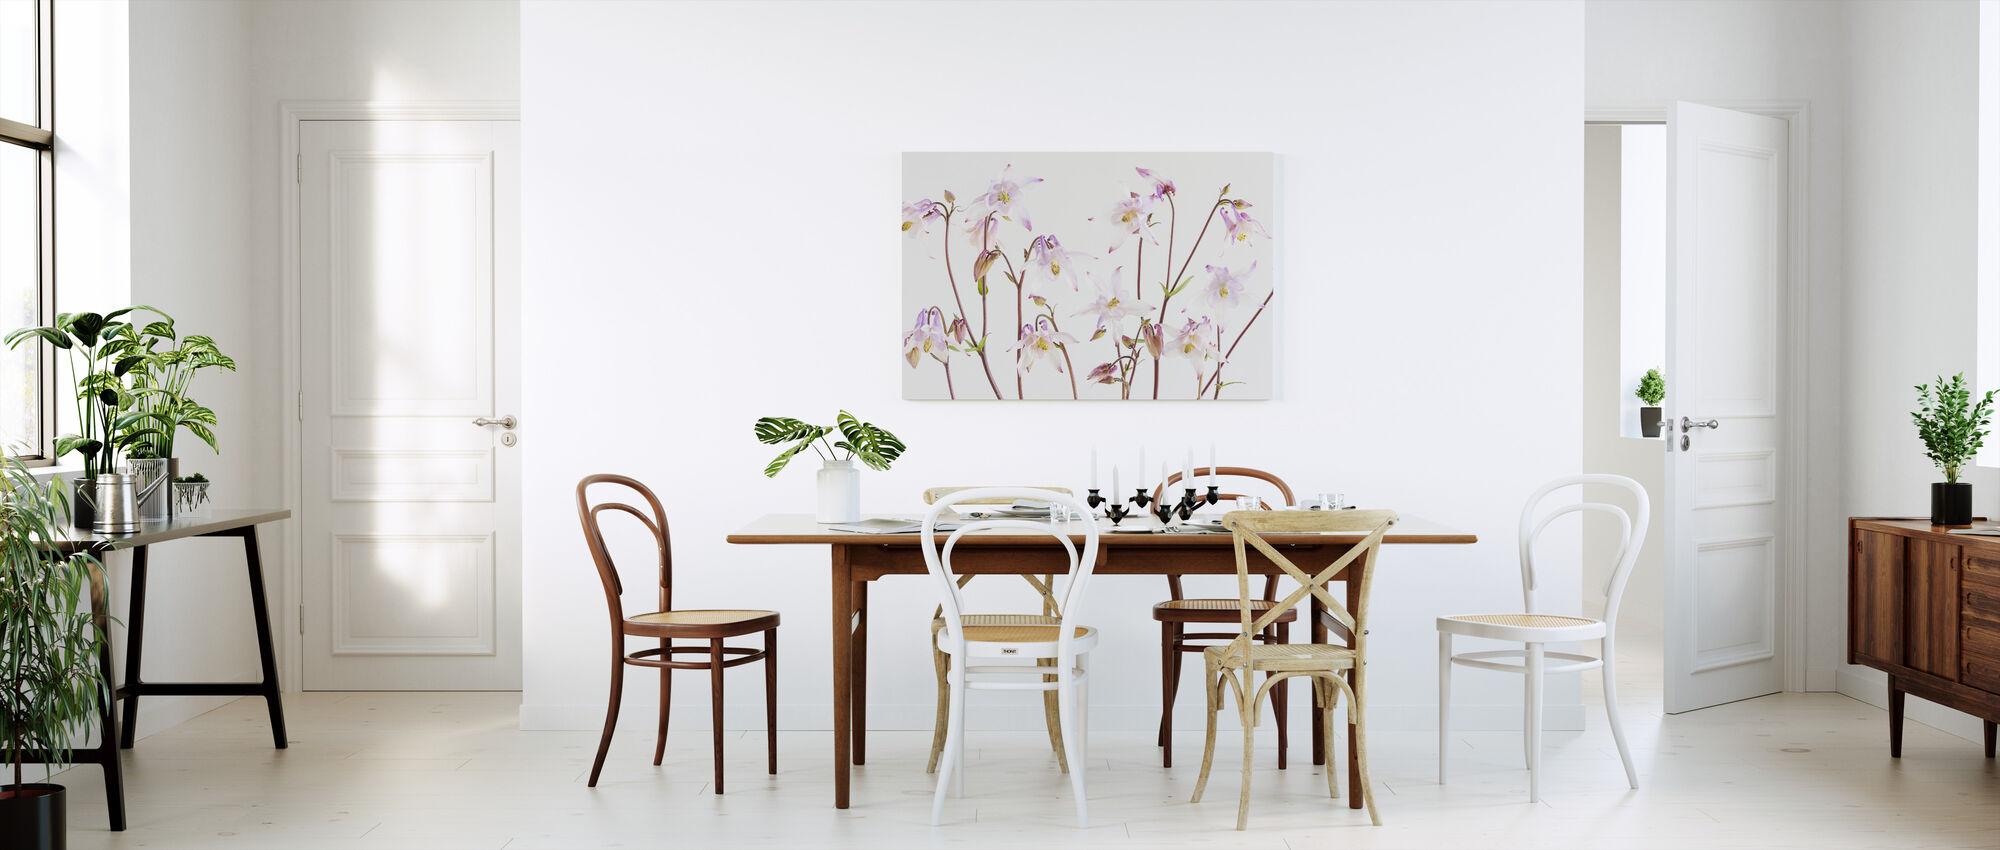 Aquilegia - Canvas print - Kitchen